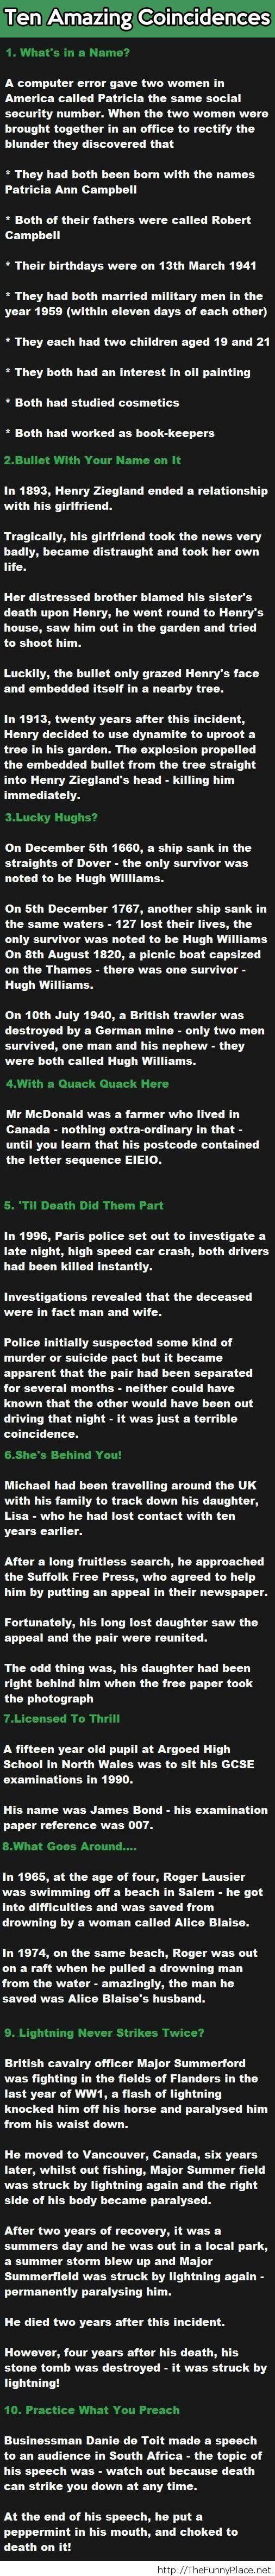 Amazing coincidences